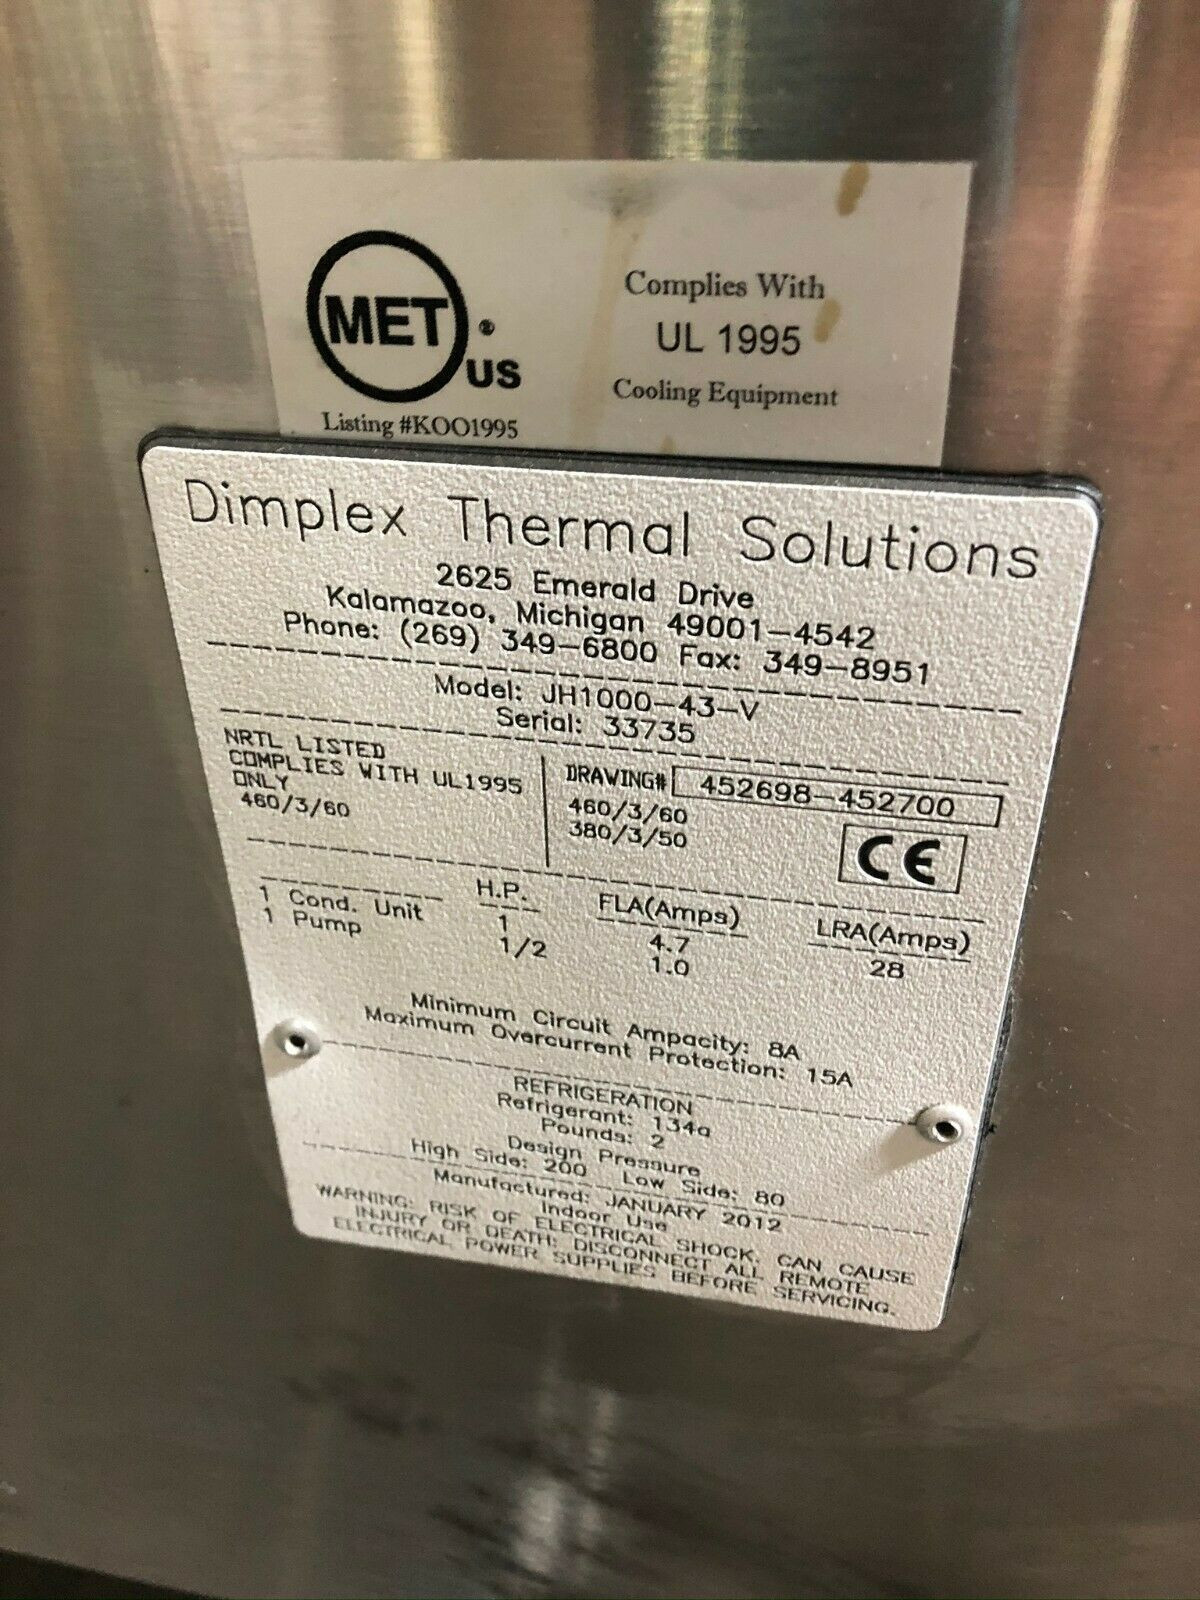 Dimplex Thermal Solution JH1000-43-V Koolant Koolers Air Cooled Chiller